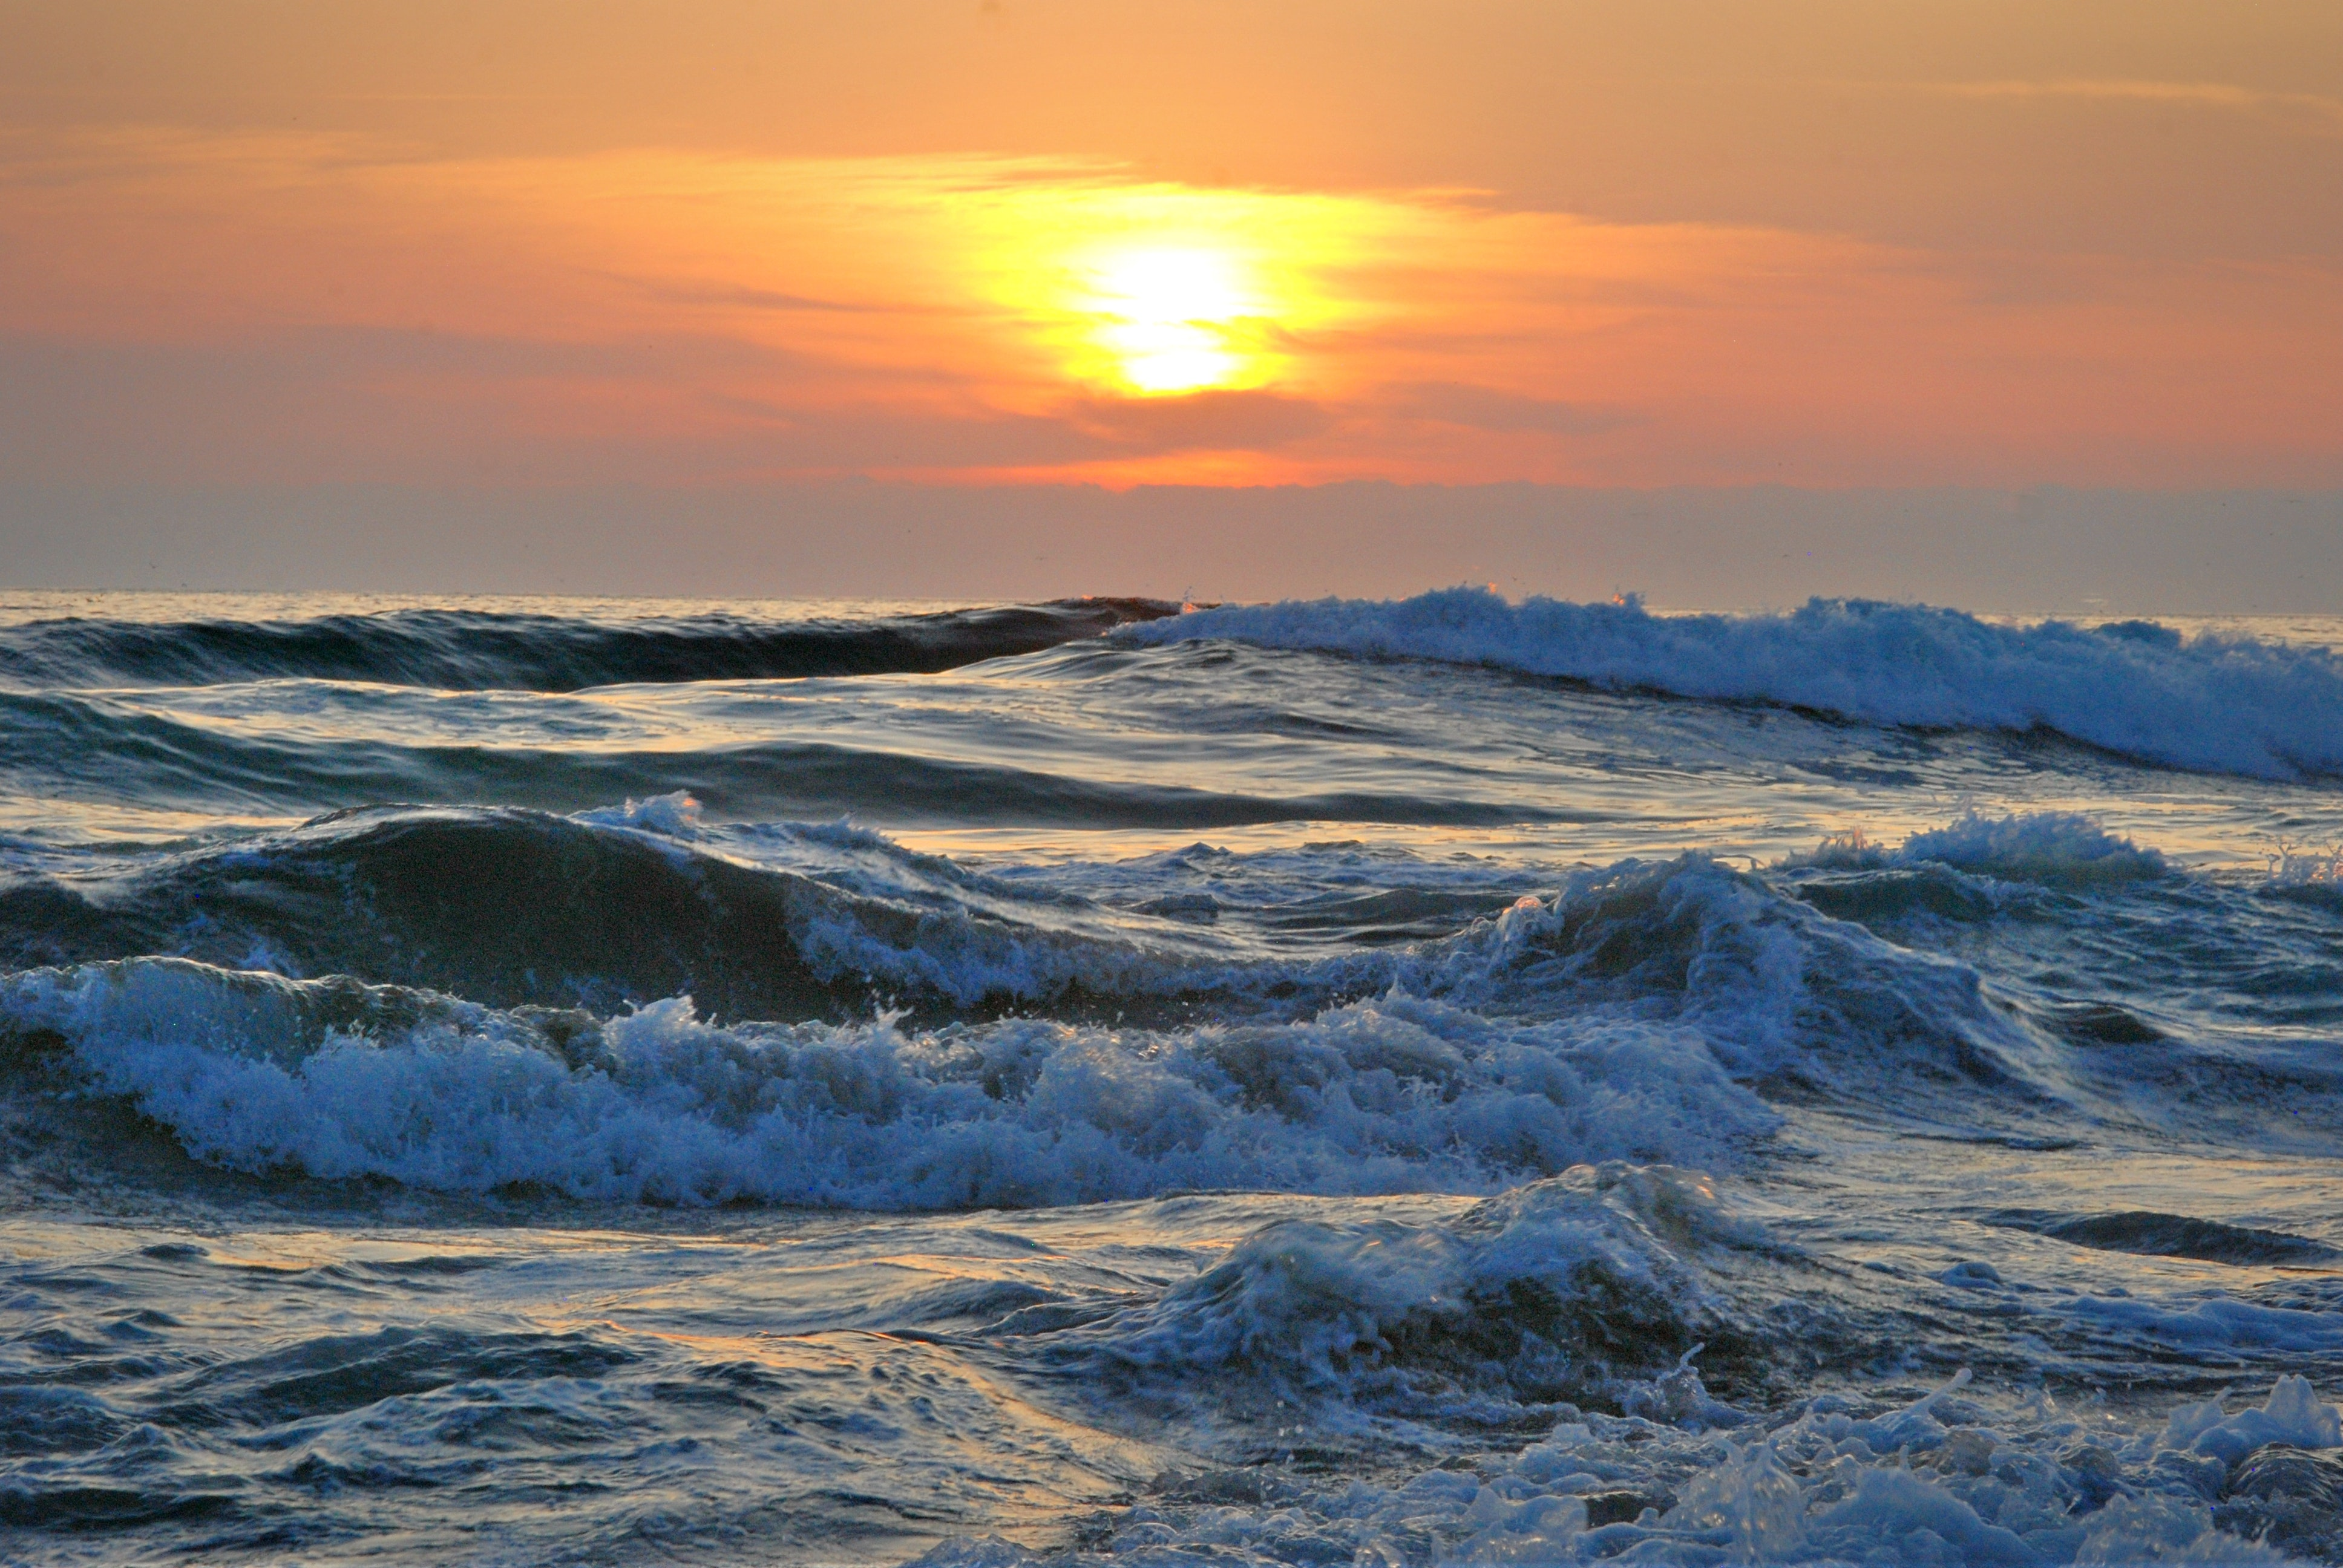 Ocean Water during Yellow Sunset · Free Stock Photo